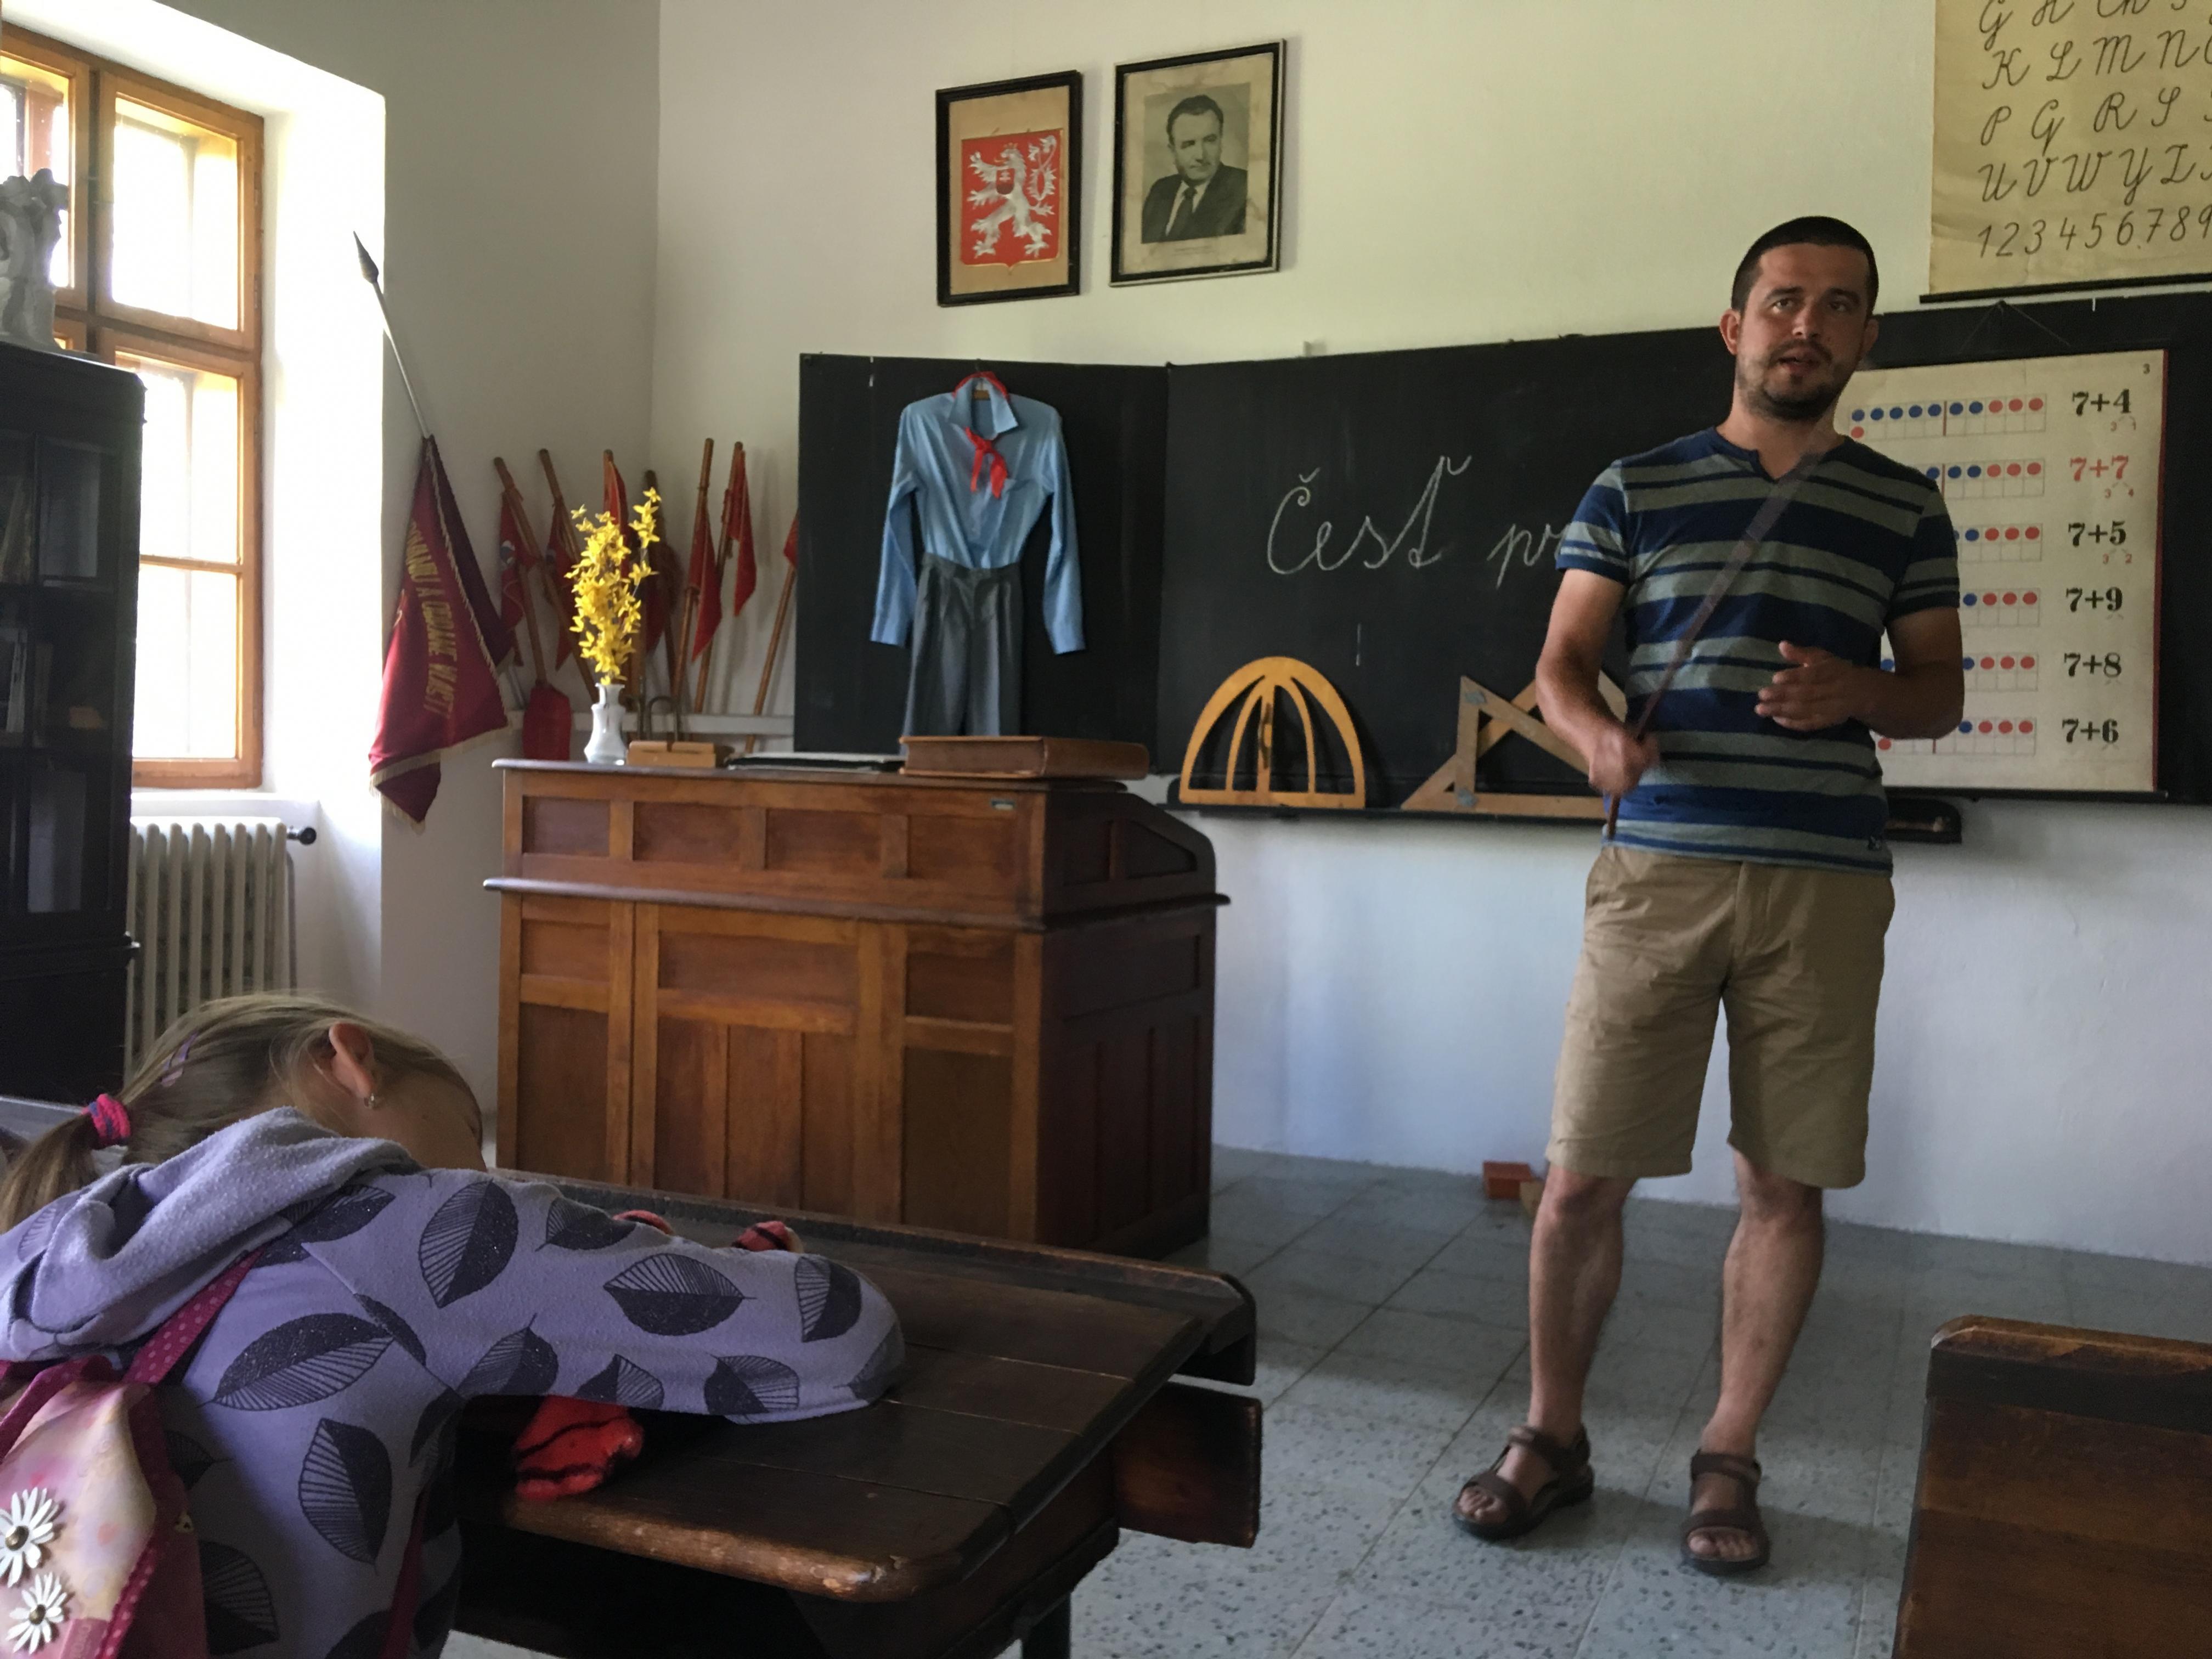 Letný tábor - liam school - history